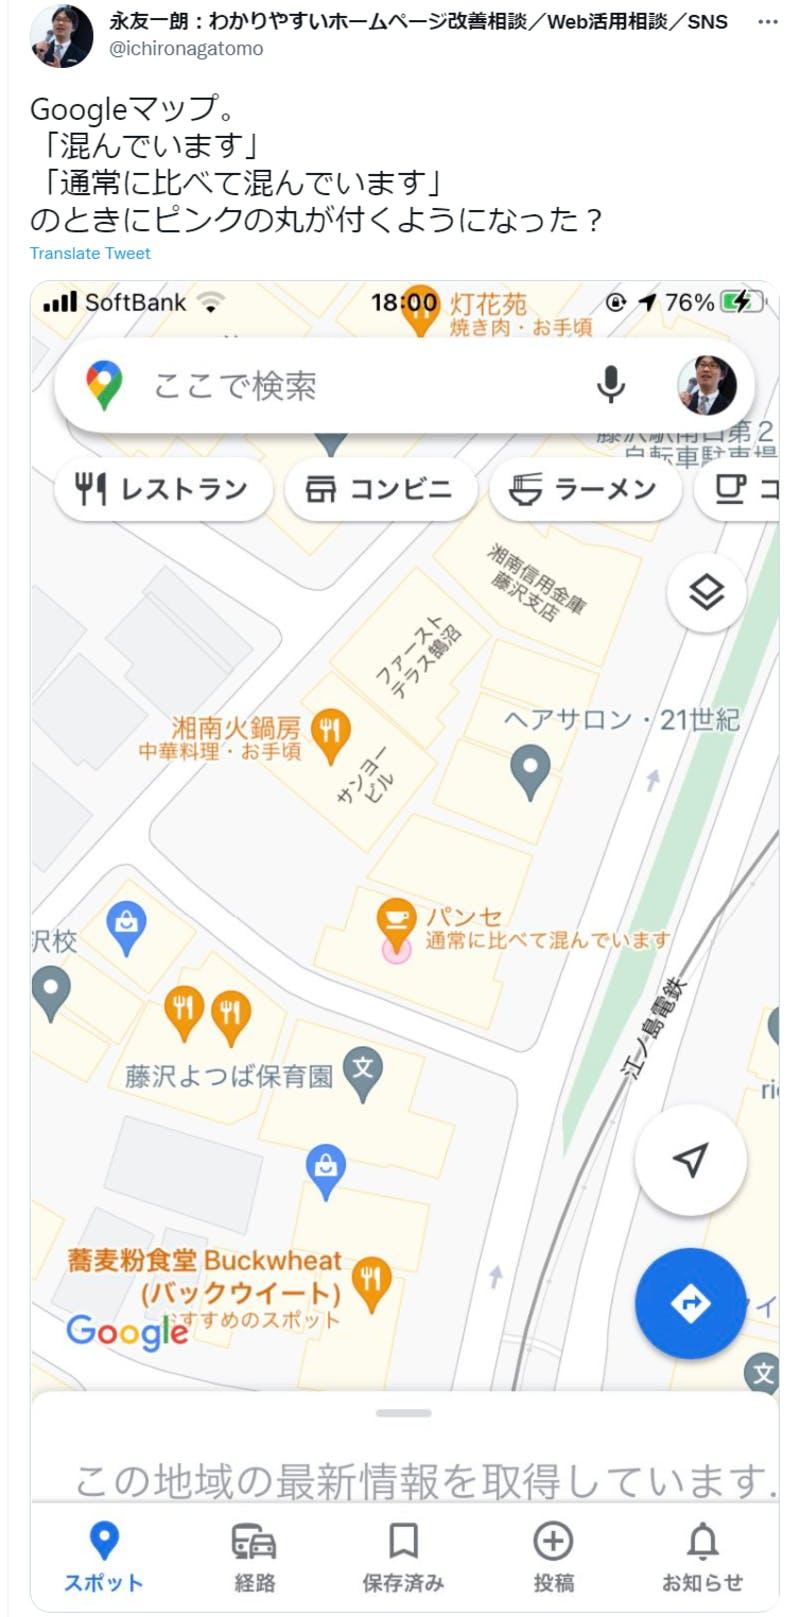 GMBエキスパート永友氏のTwitter投稿:編集部スクリーンショット